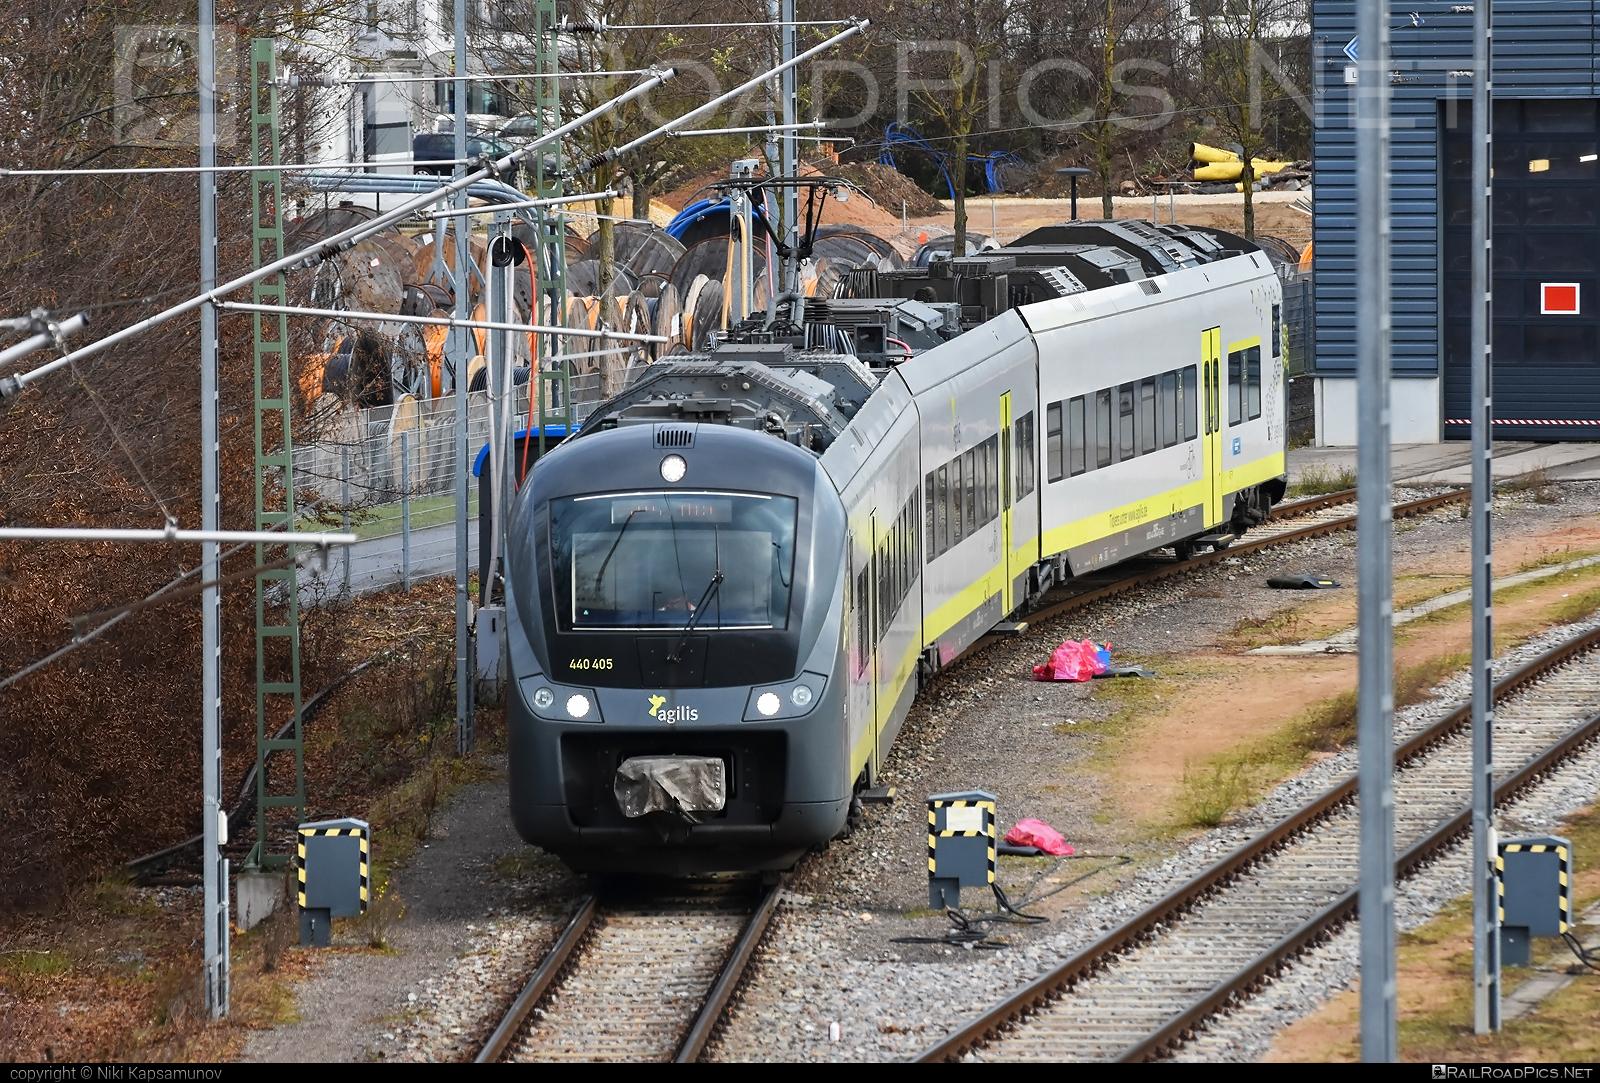 Alstom Coradia Continental - 440 405 operated by Agilis Verkersgesellschaft mbH & Co KG #agilis #agilisverkersgesellschaft #alstom #alstomcoradia #alstomcoradiacontinental